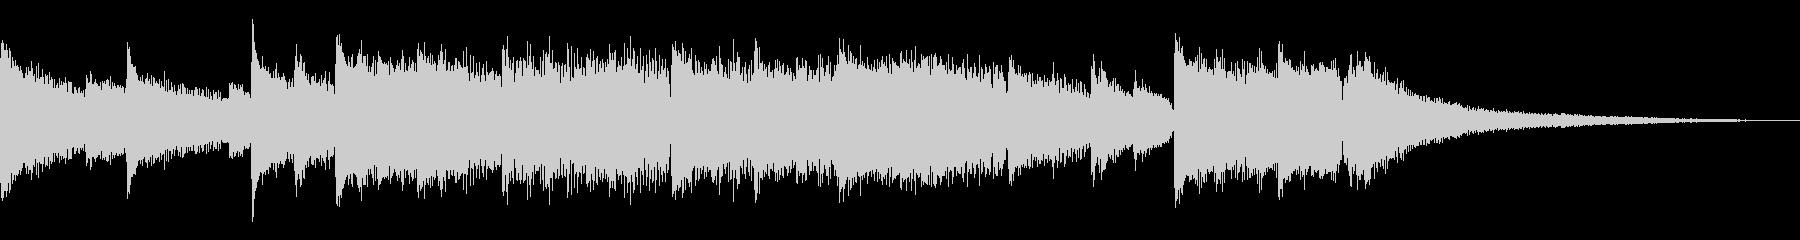 VP・CM 癒やし系ピアノソロの未再生の波形